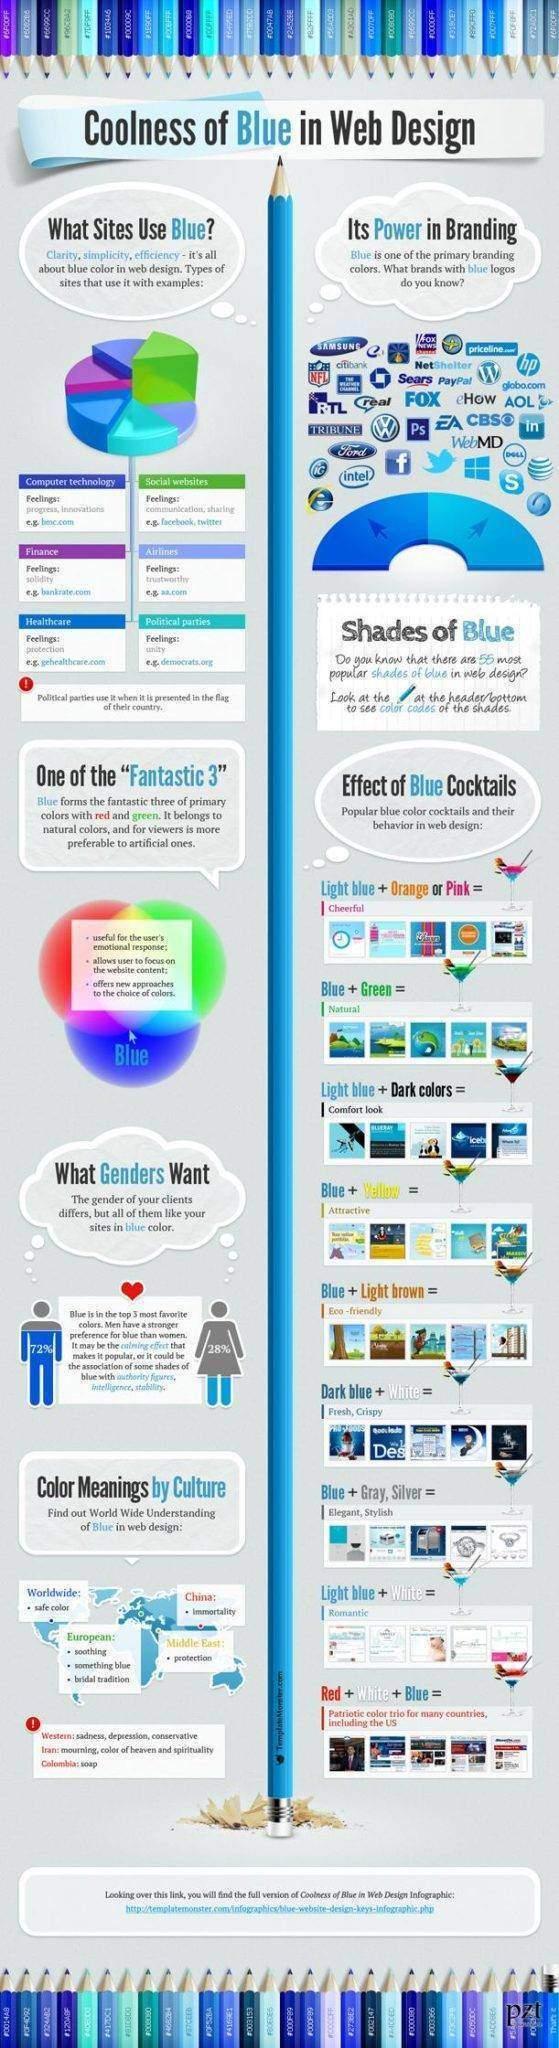 agencia seo -pzt- internet evolucion azul - 02